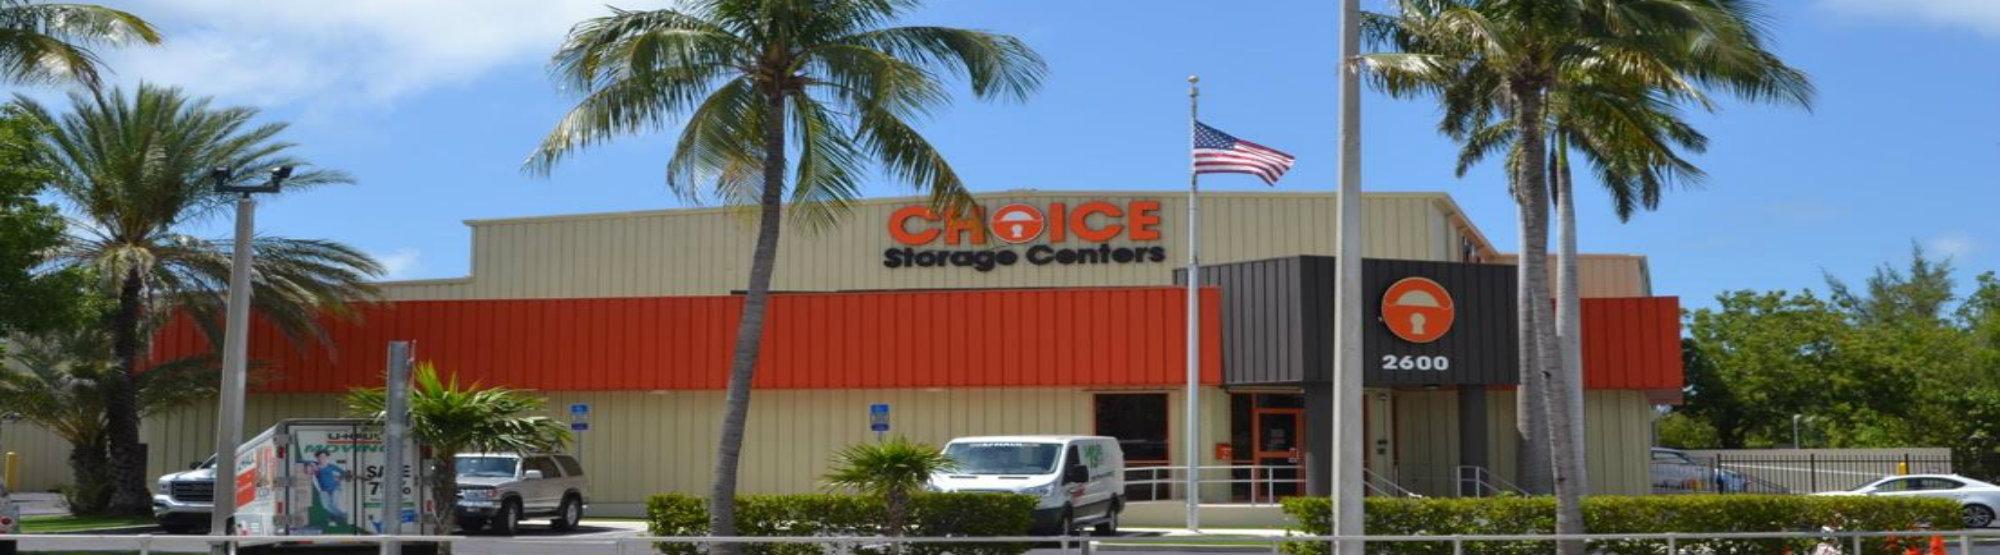 High Quality ... Choice Storage Centers; Storage Units ...